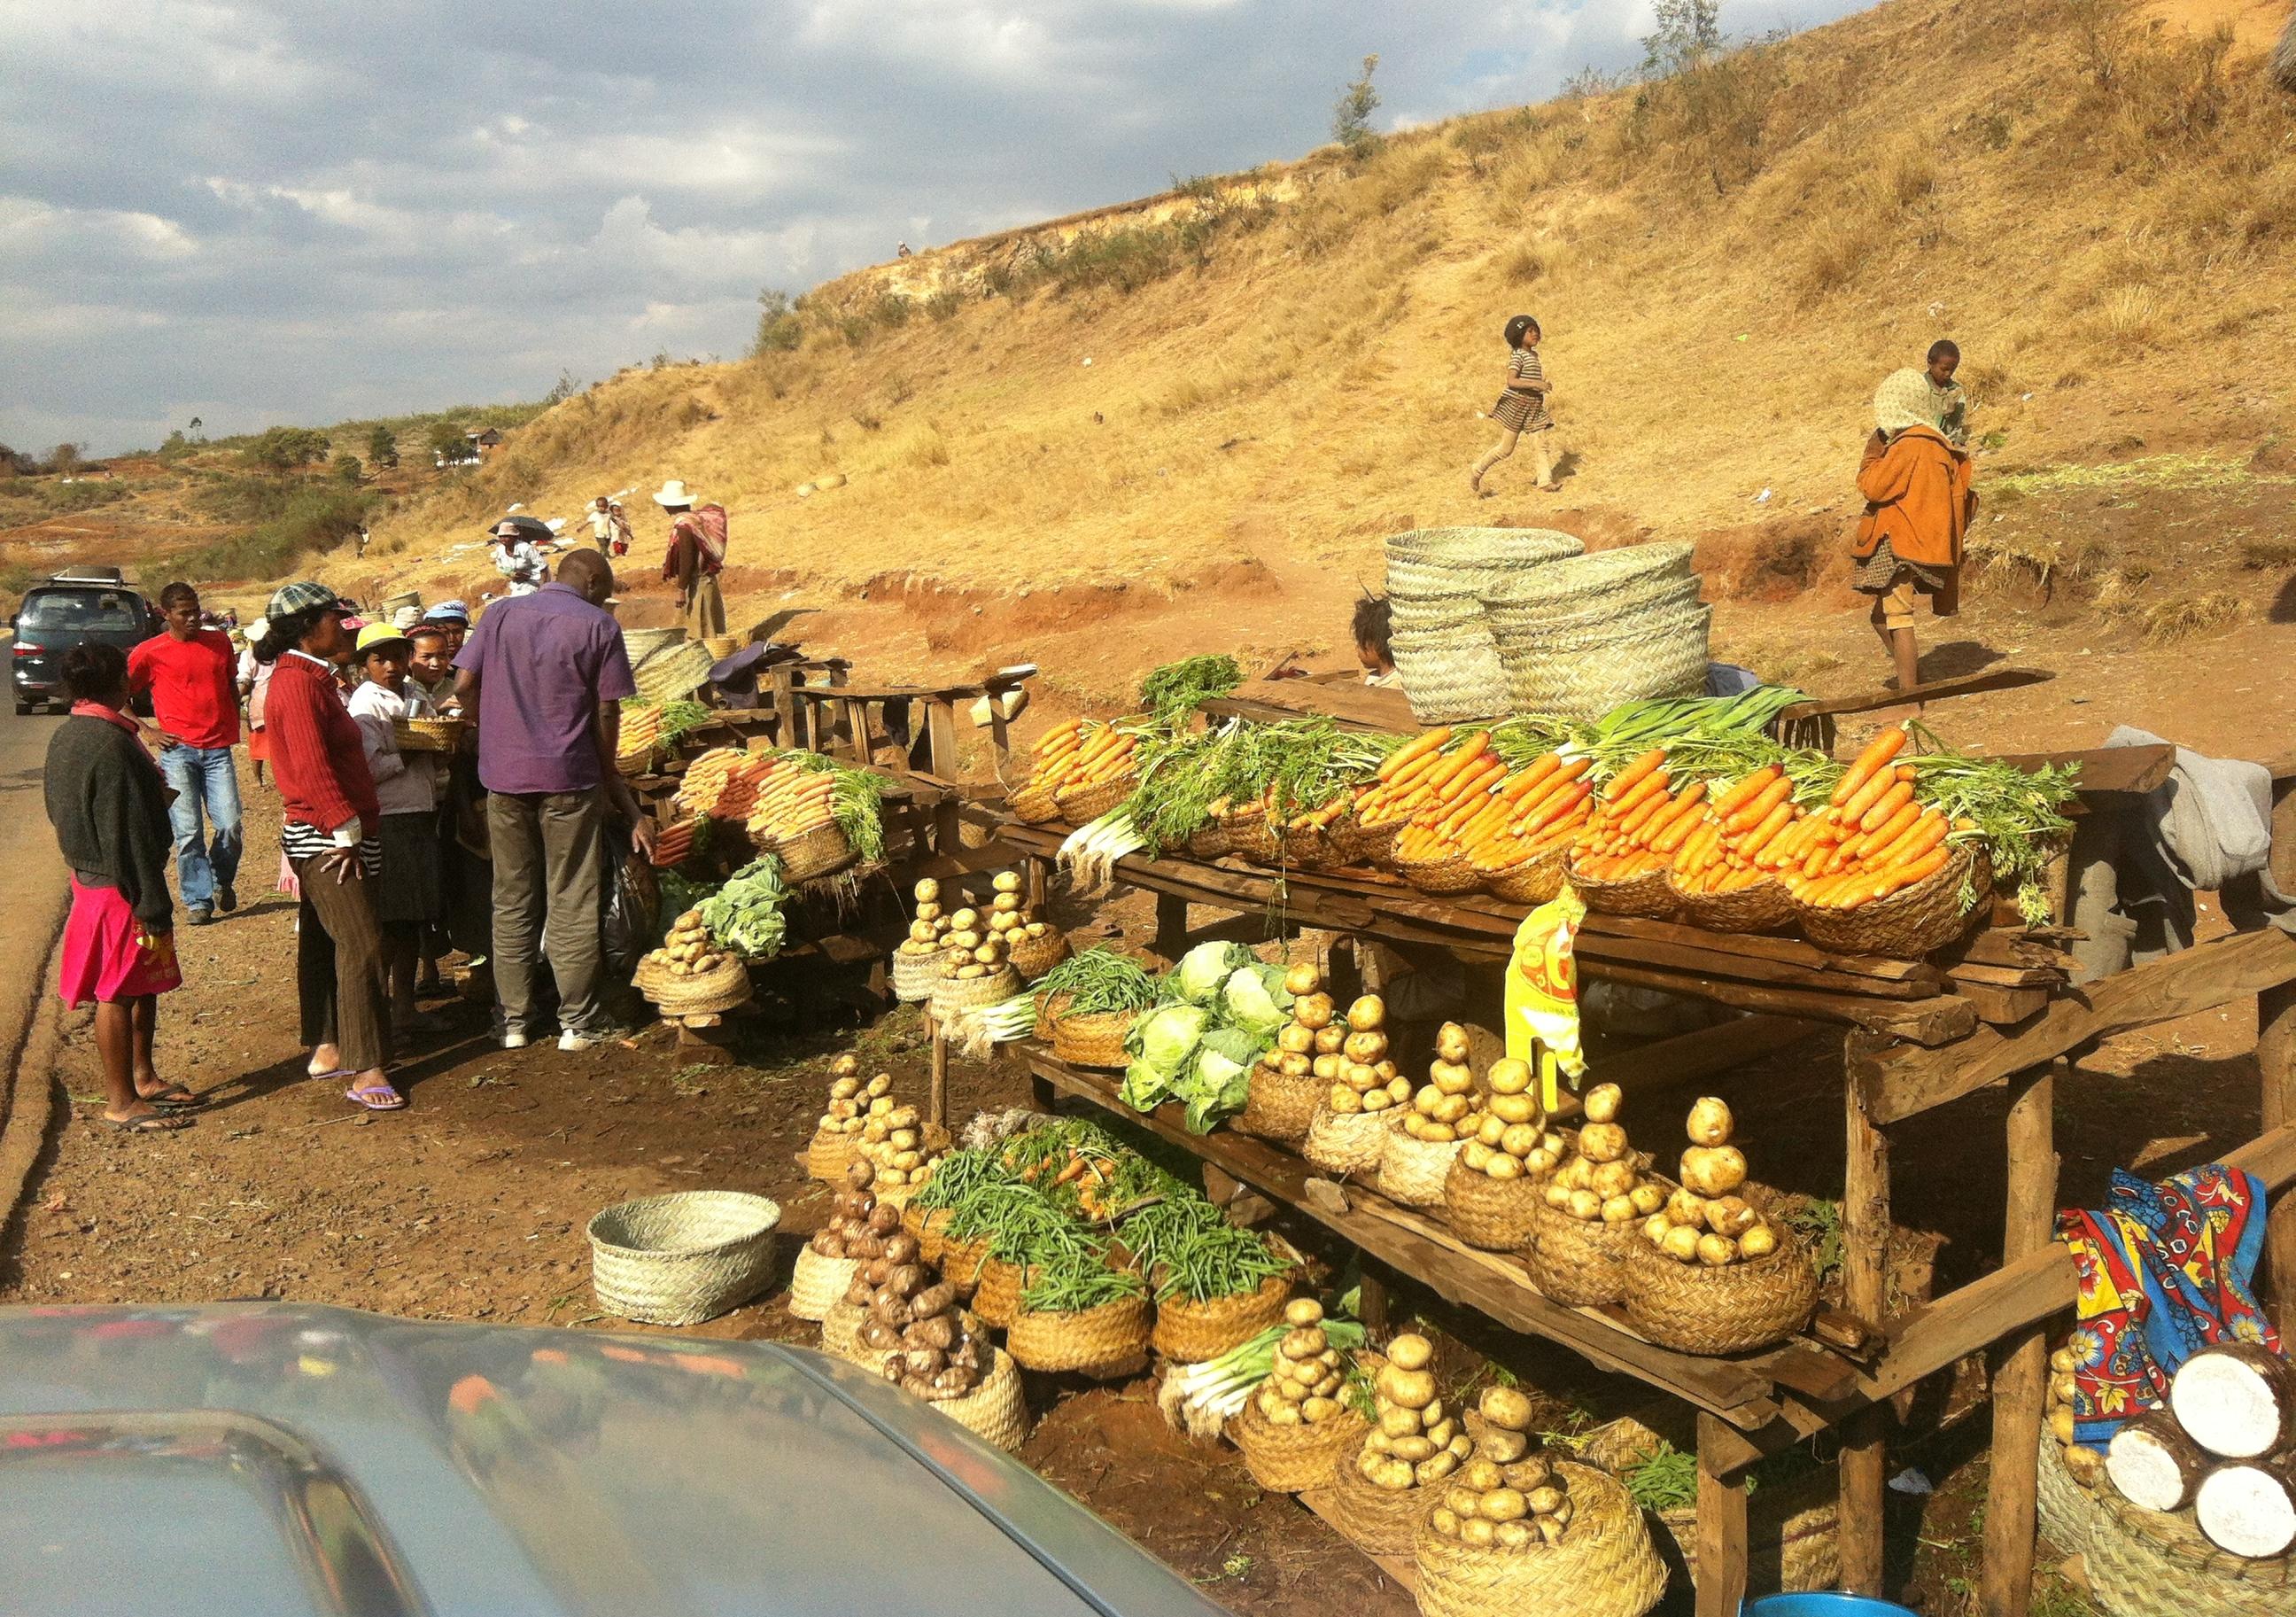 Roadside food stalls in Madagascar